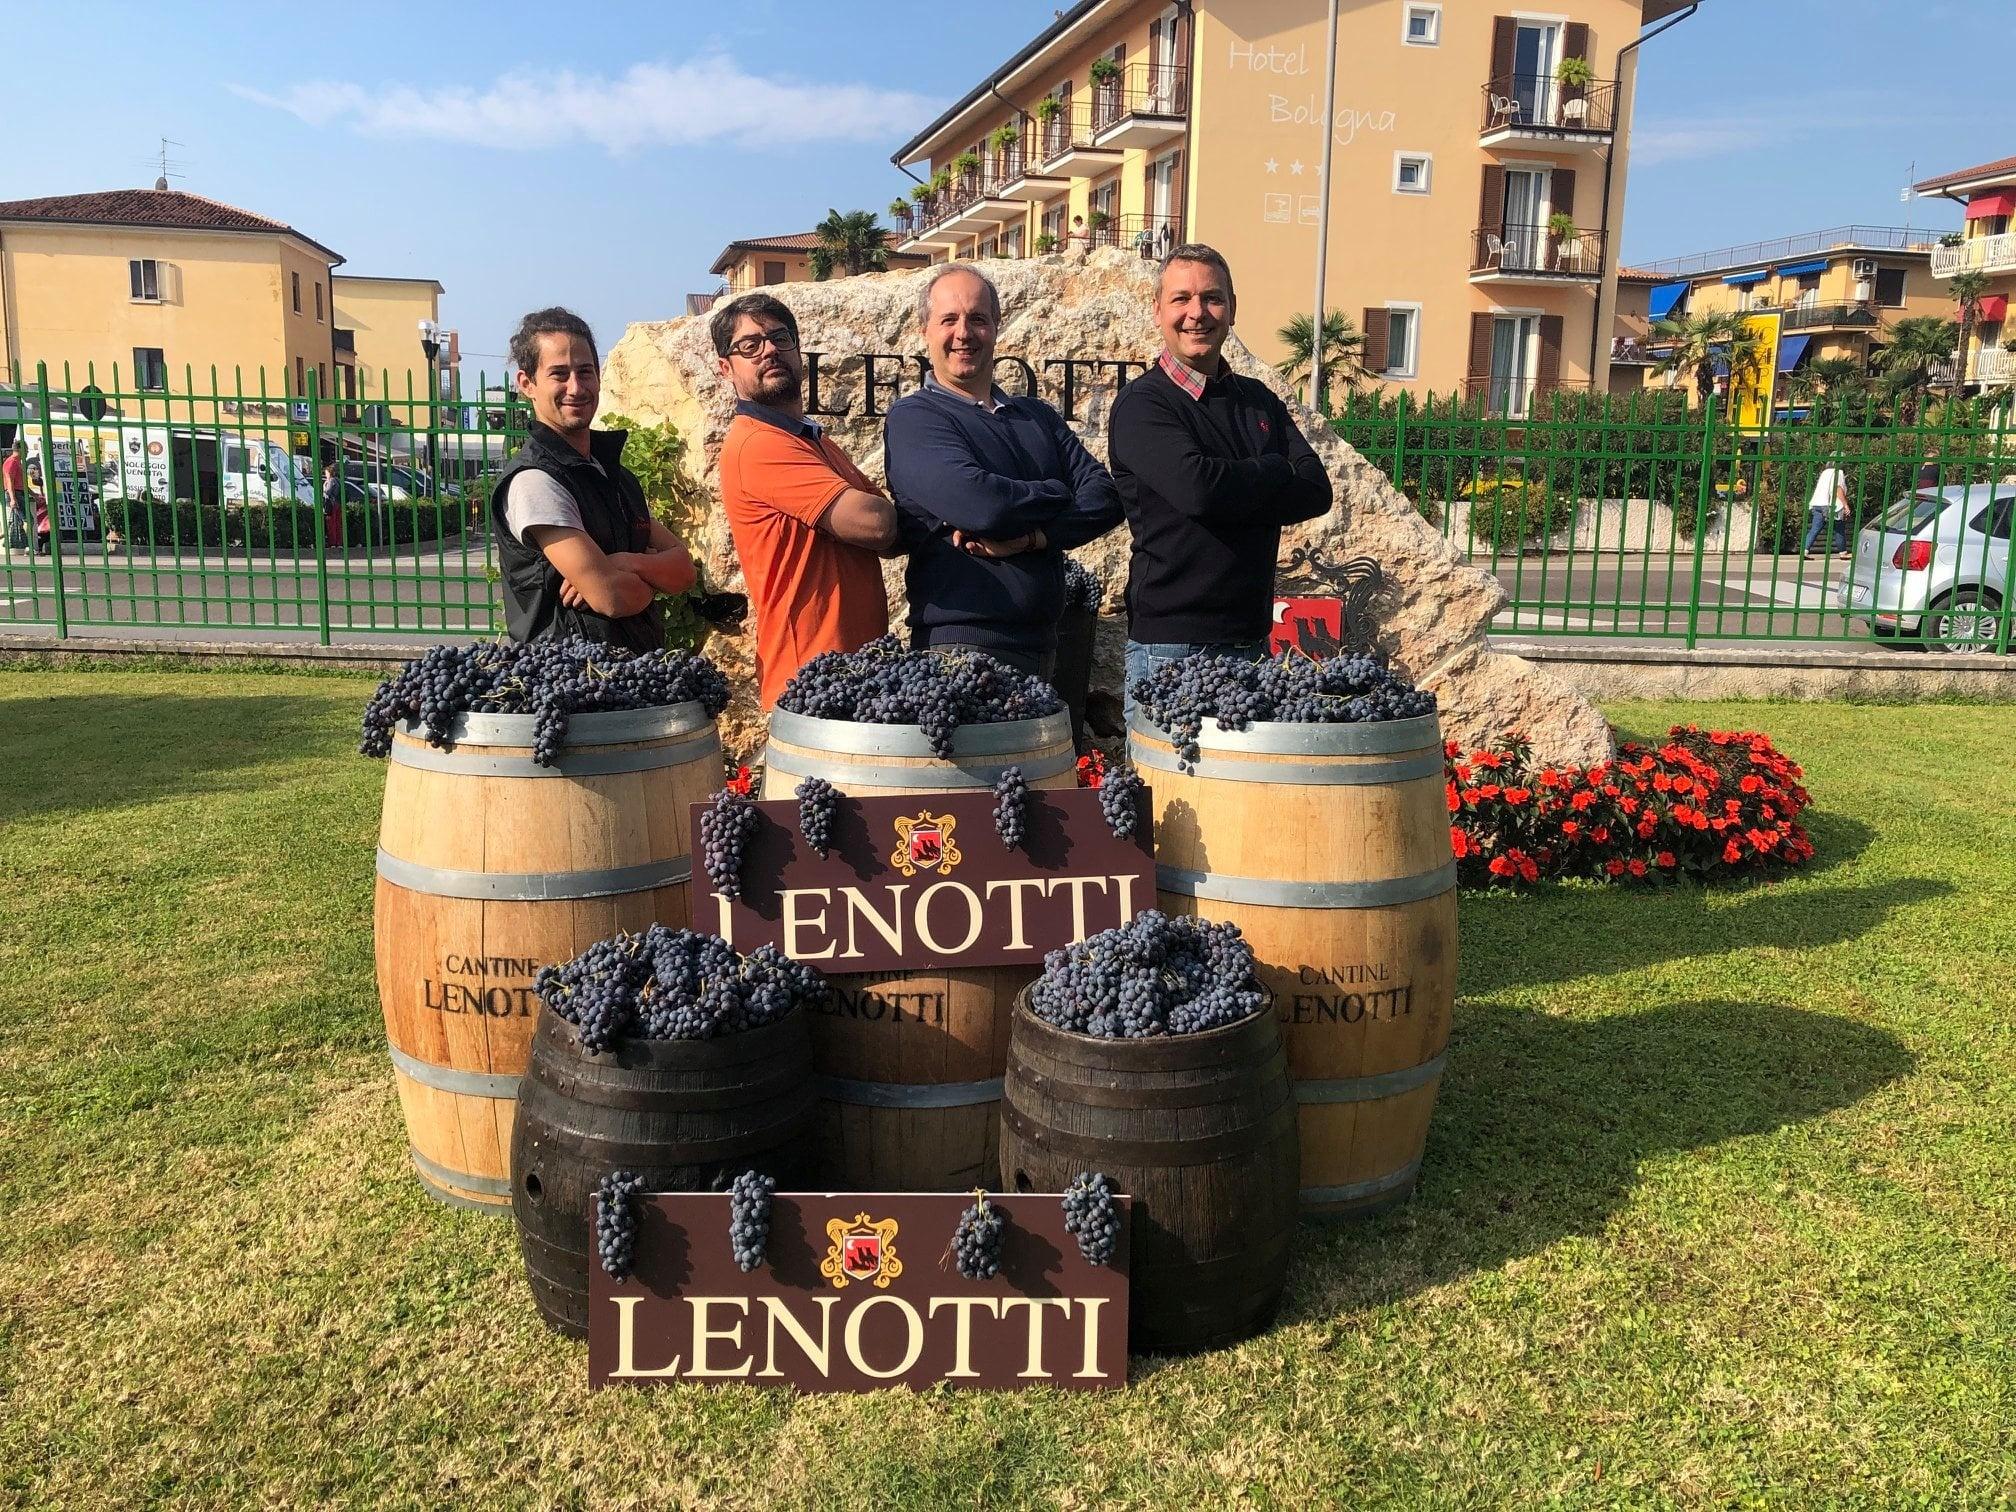 Cantine Lenotti terug van weggeweest !